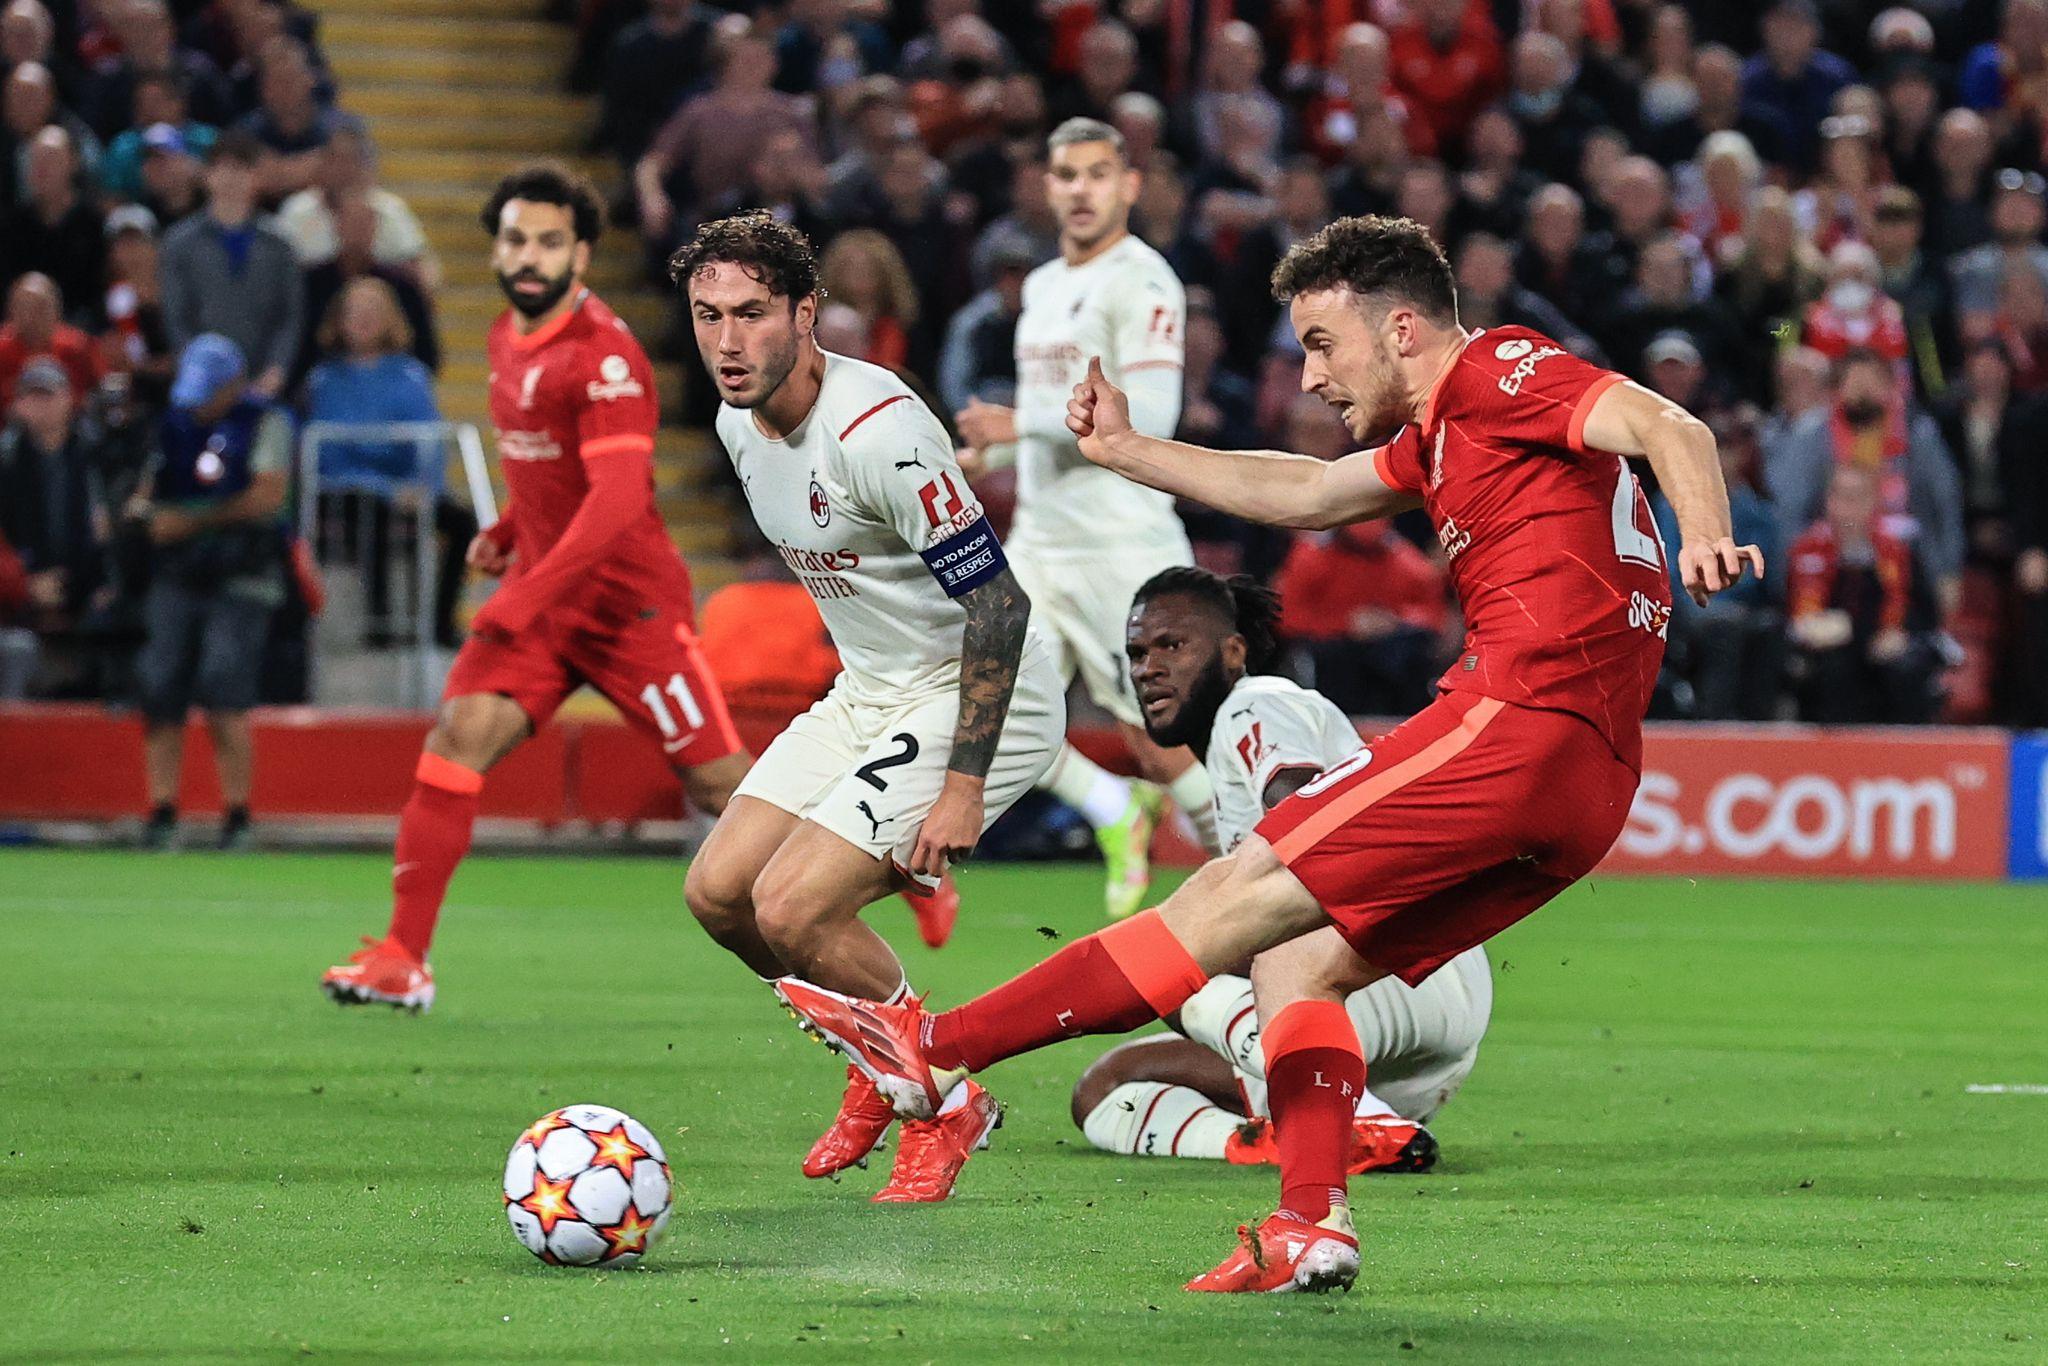 Liverpool-Milan: Davide Calabria, Franck Kessie, Theo Hernandez, Andrew Robertson e Mohamed Salah (Photo Credit: Agenzia Fotogramma)